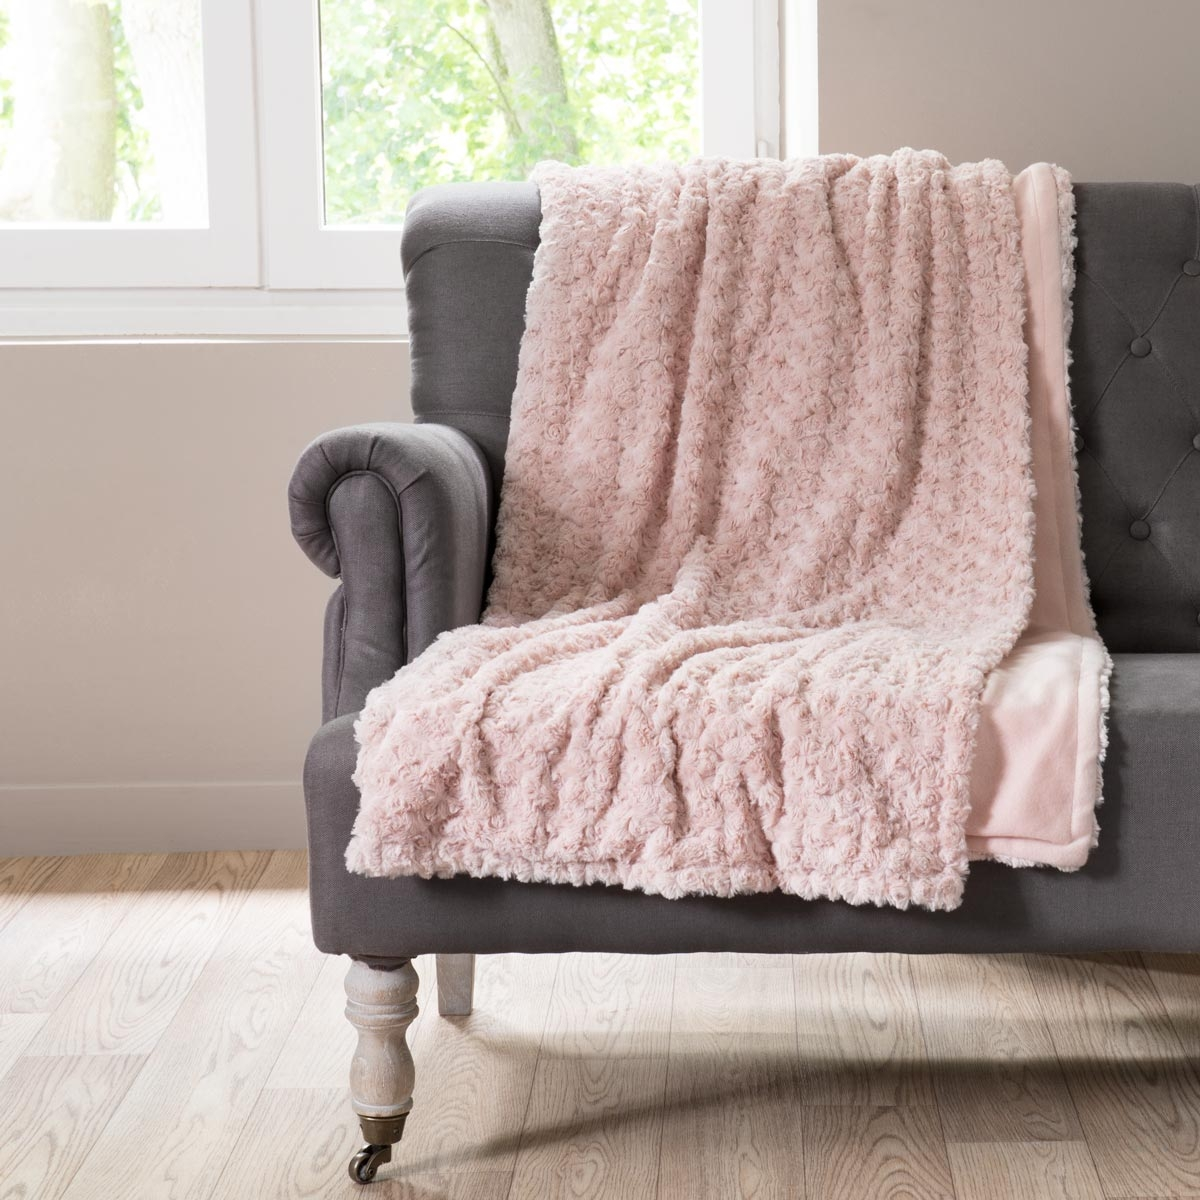 chauffeuse lilas rose maisons du monde pickture. Black Bedroom Furniture Sets. Home Design Ideas